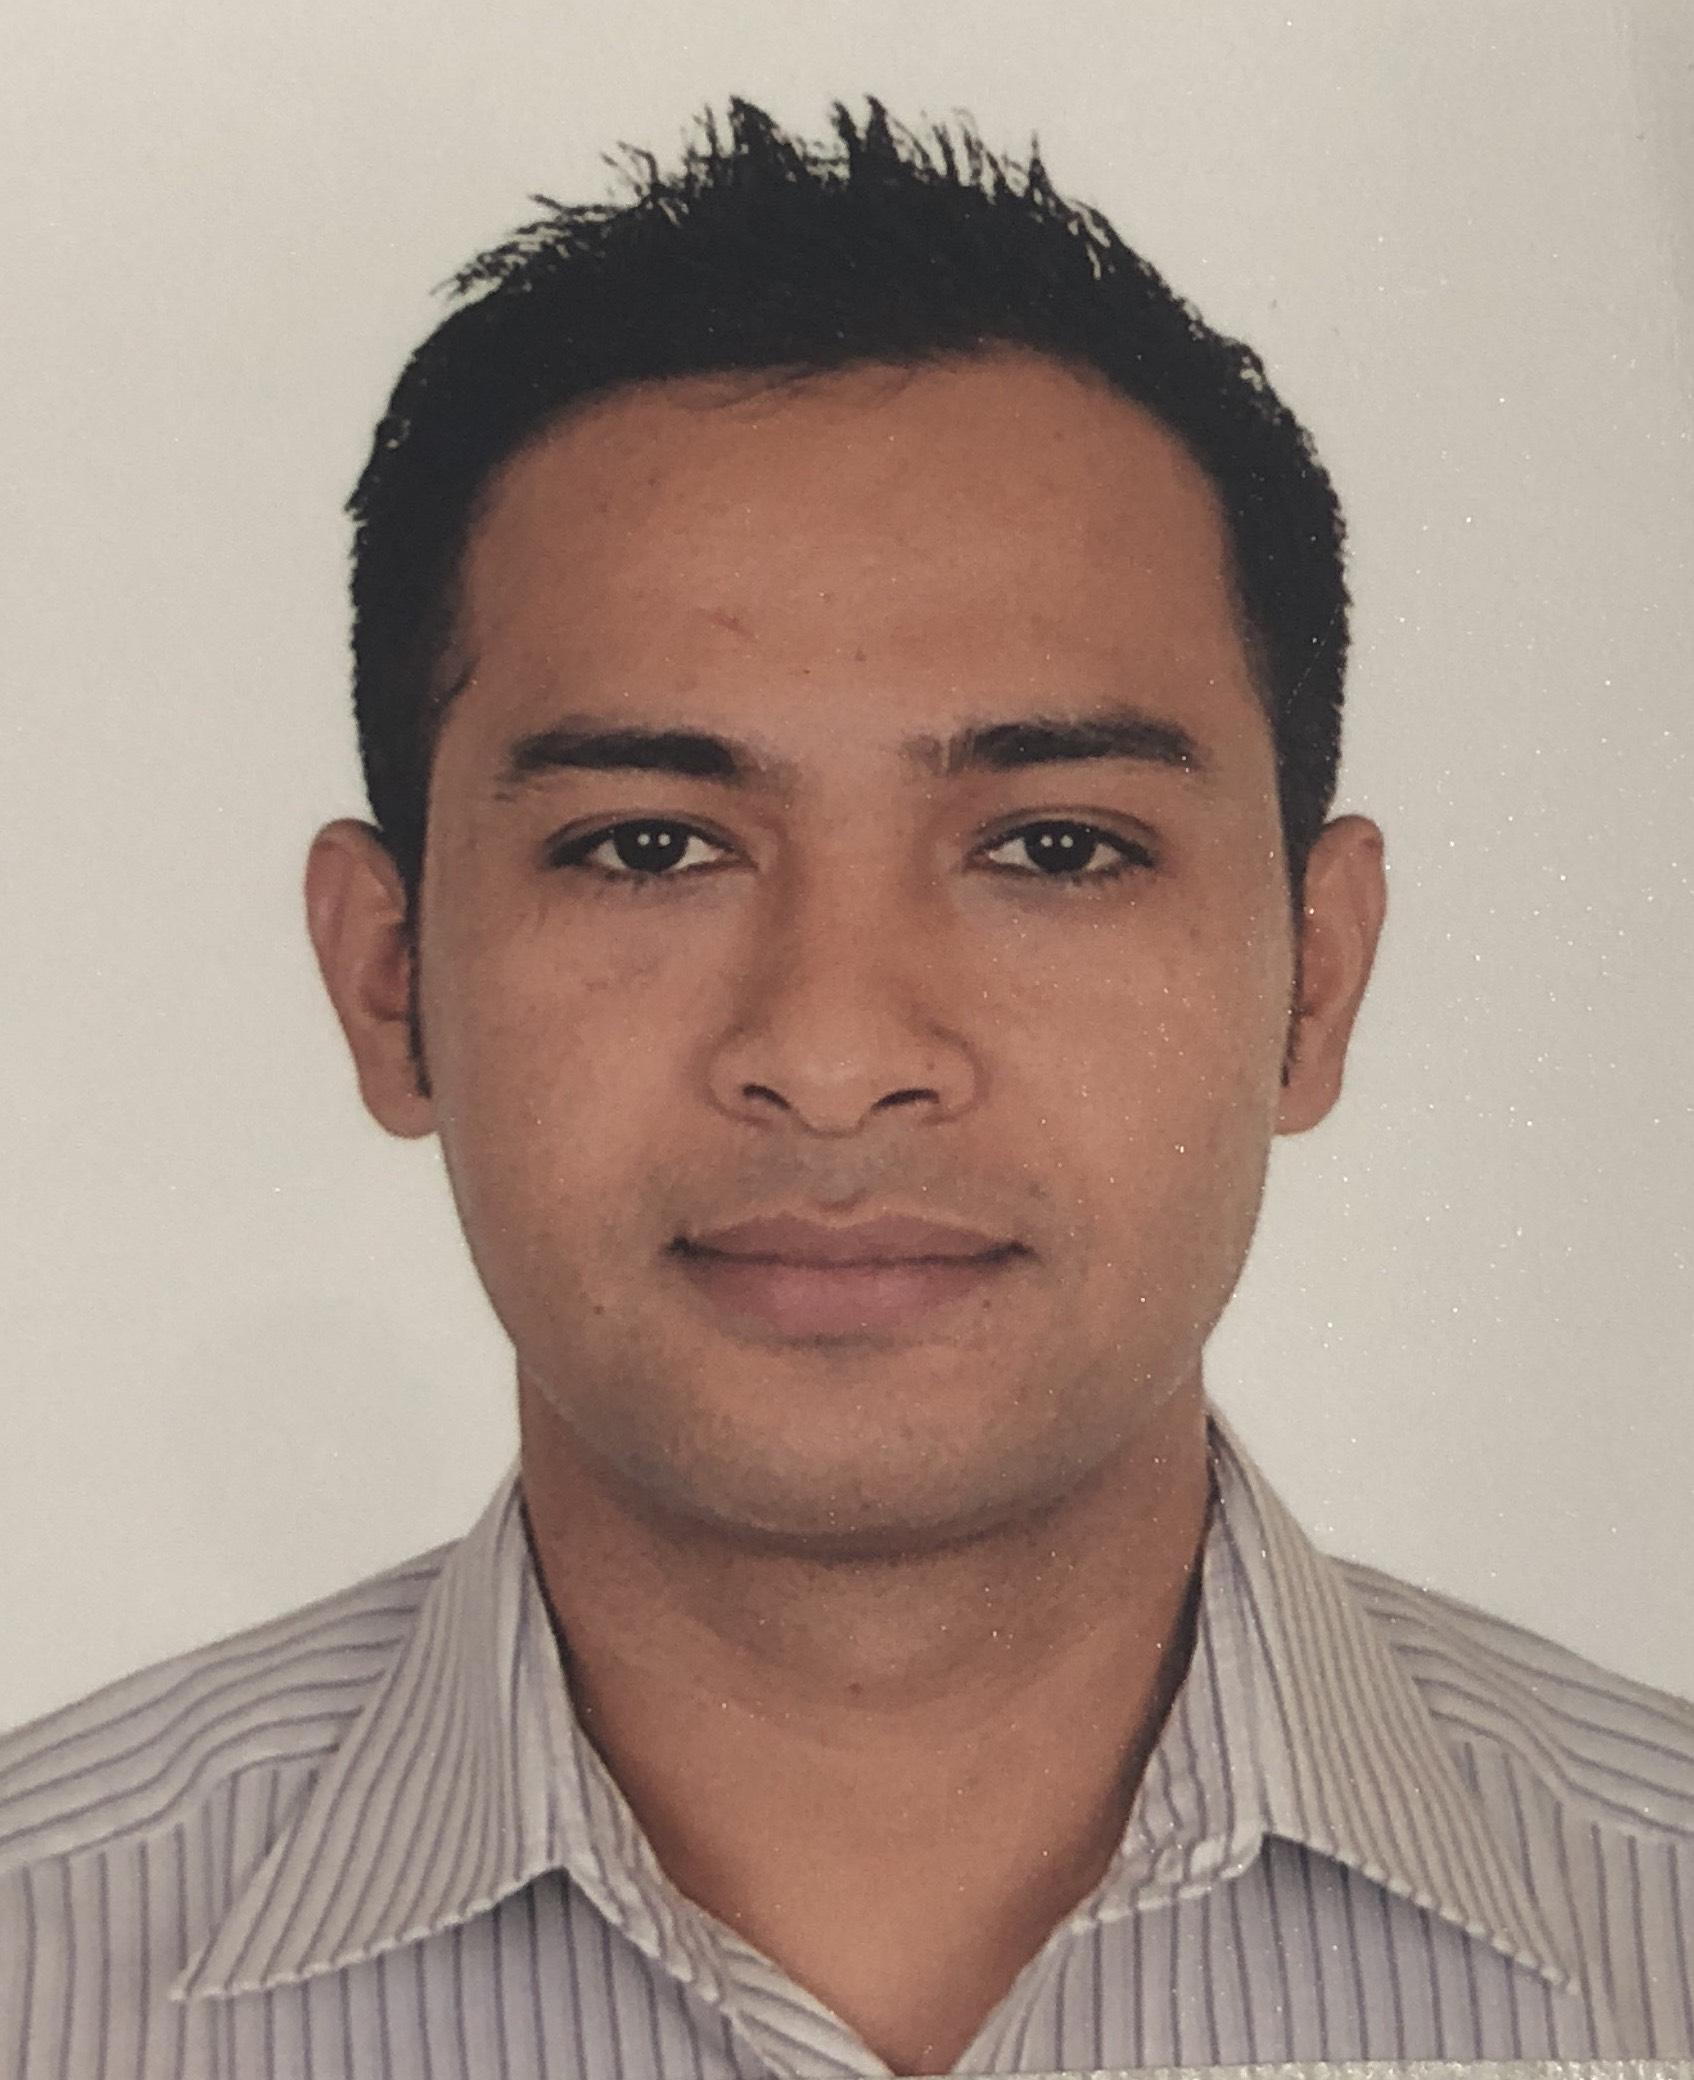 Arjun Pokhrel